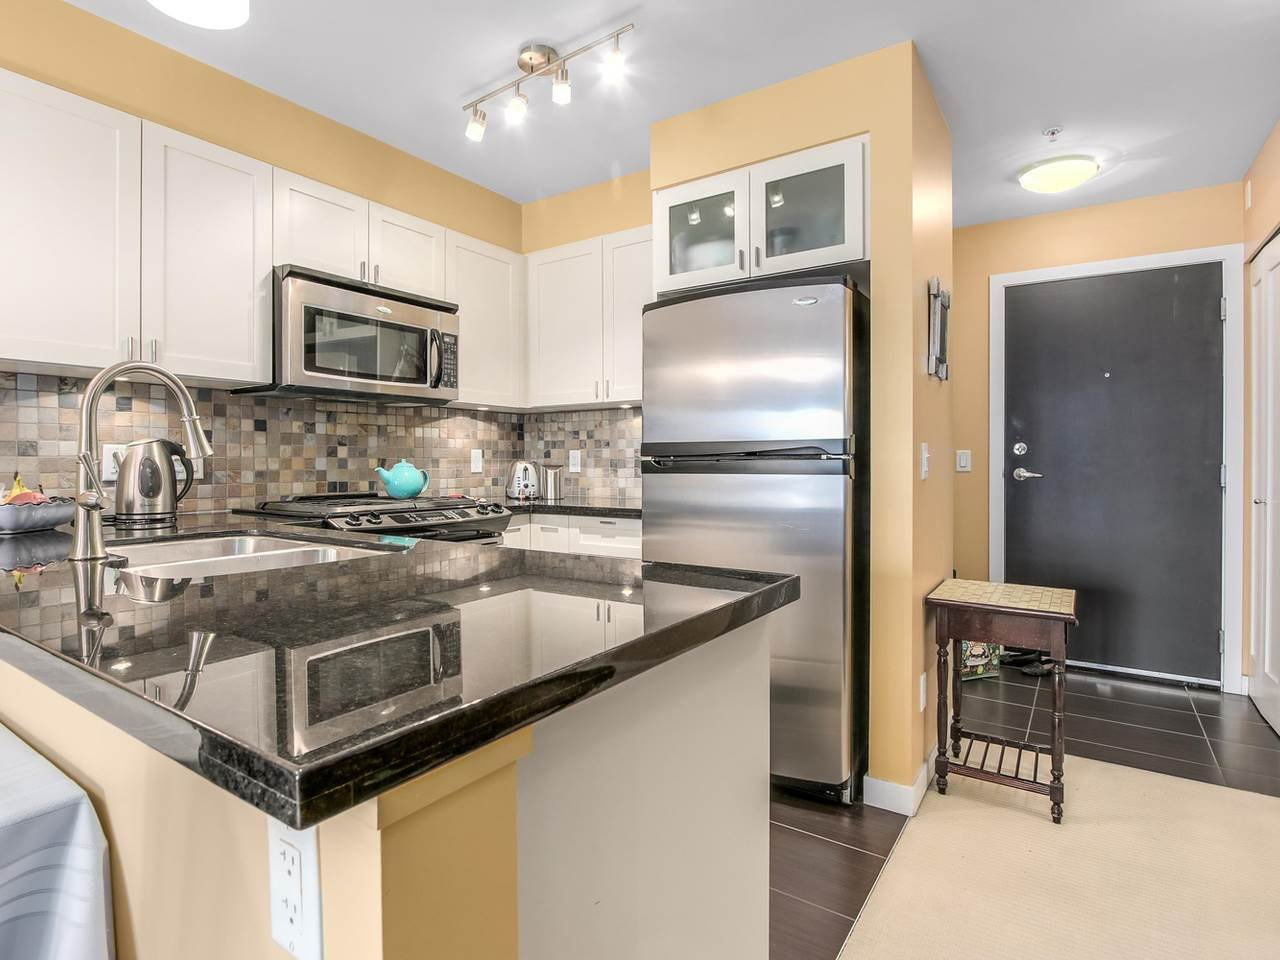 "Photo 5: Photos: 304 405 SKEENA Street in Vancouver: Renfrew VE Condo for sale in ""THE JASMINE"" (Vancouver East)  : MLS®# R2150679"